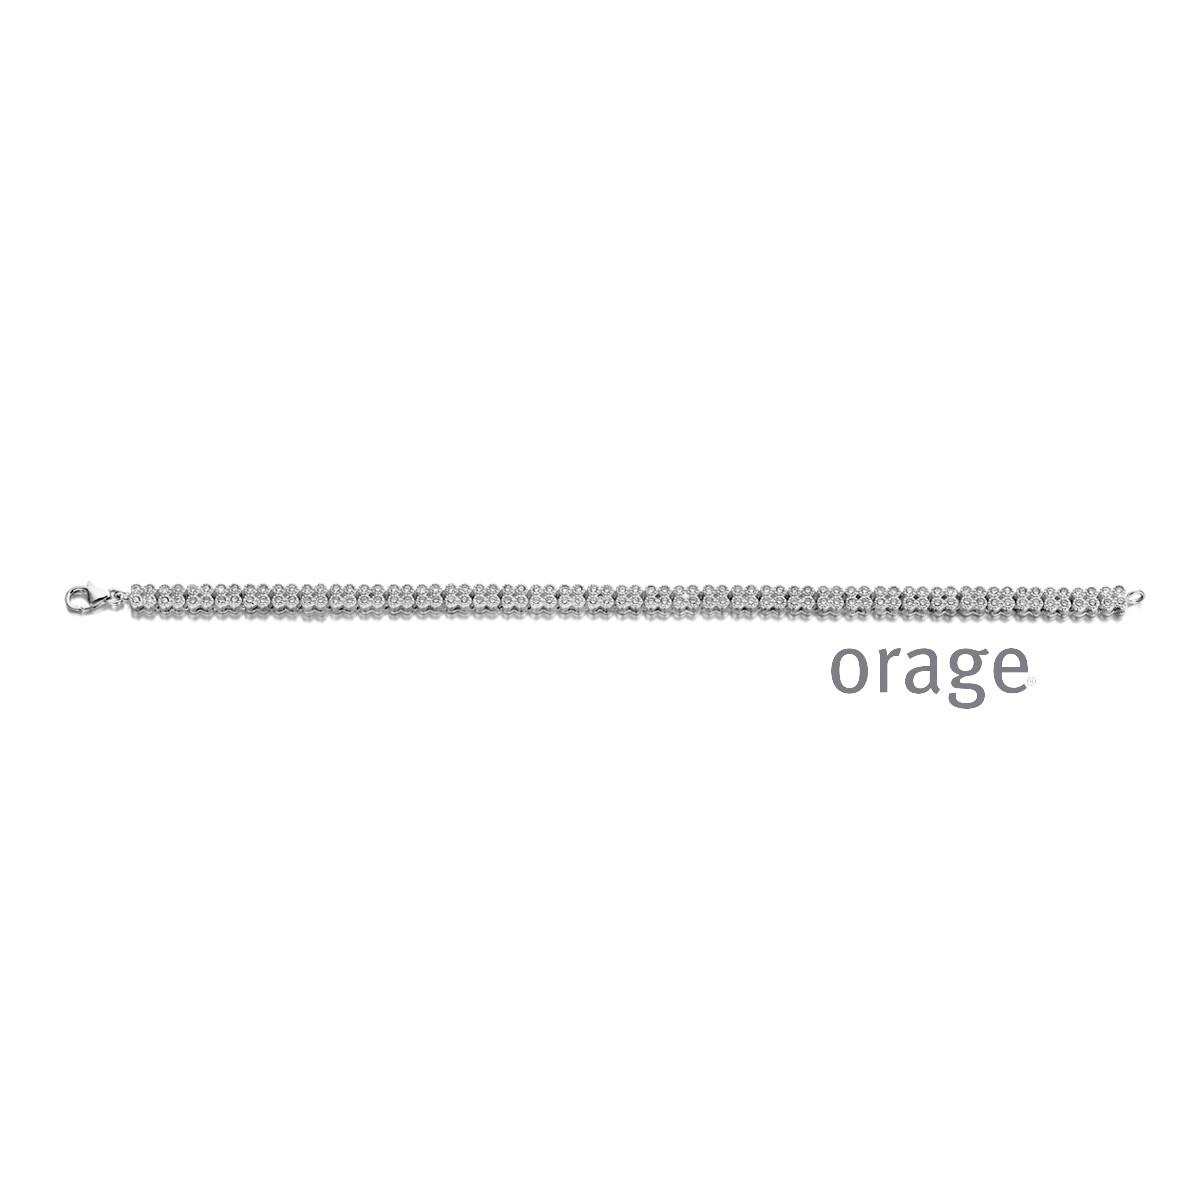 Orage:  AR109-AP004 Armband 925 rh cz (V/28)